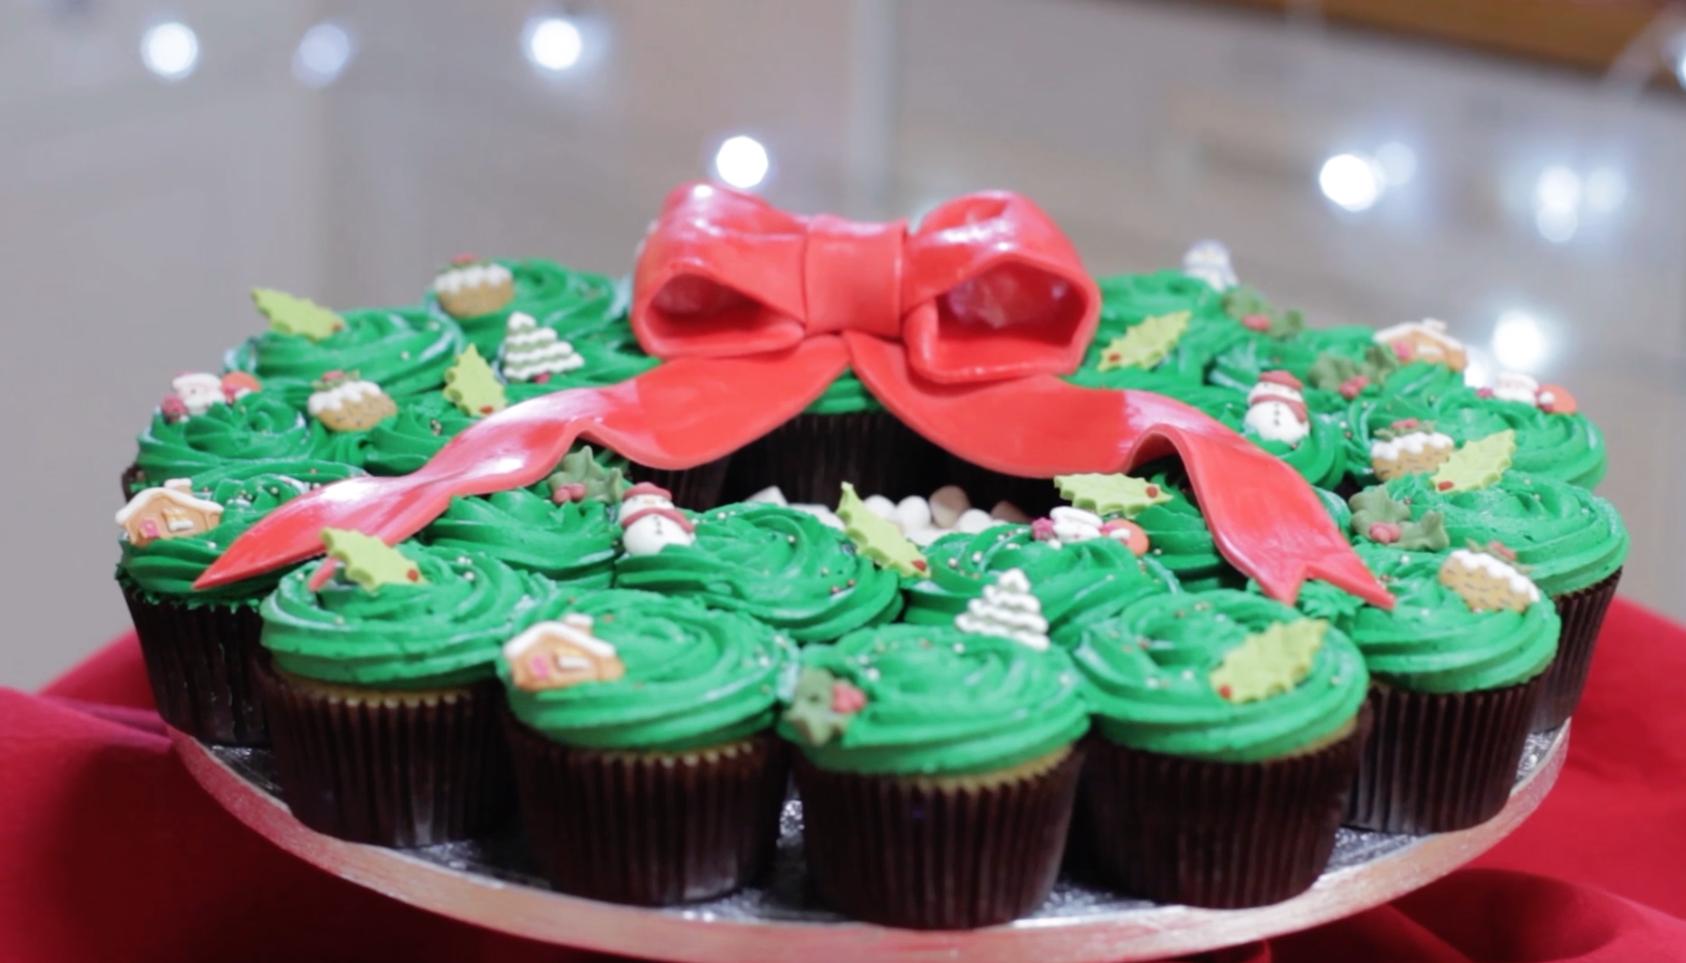 How to Make a Pull Apart Christmas Cupcake Wreath